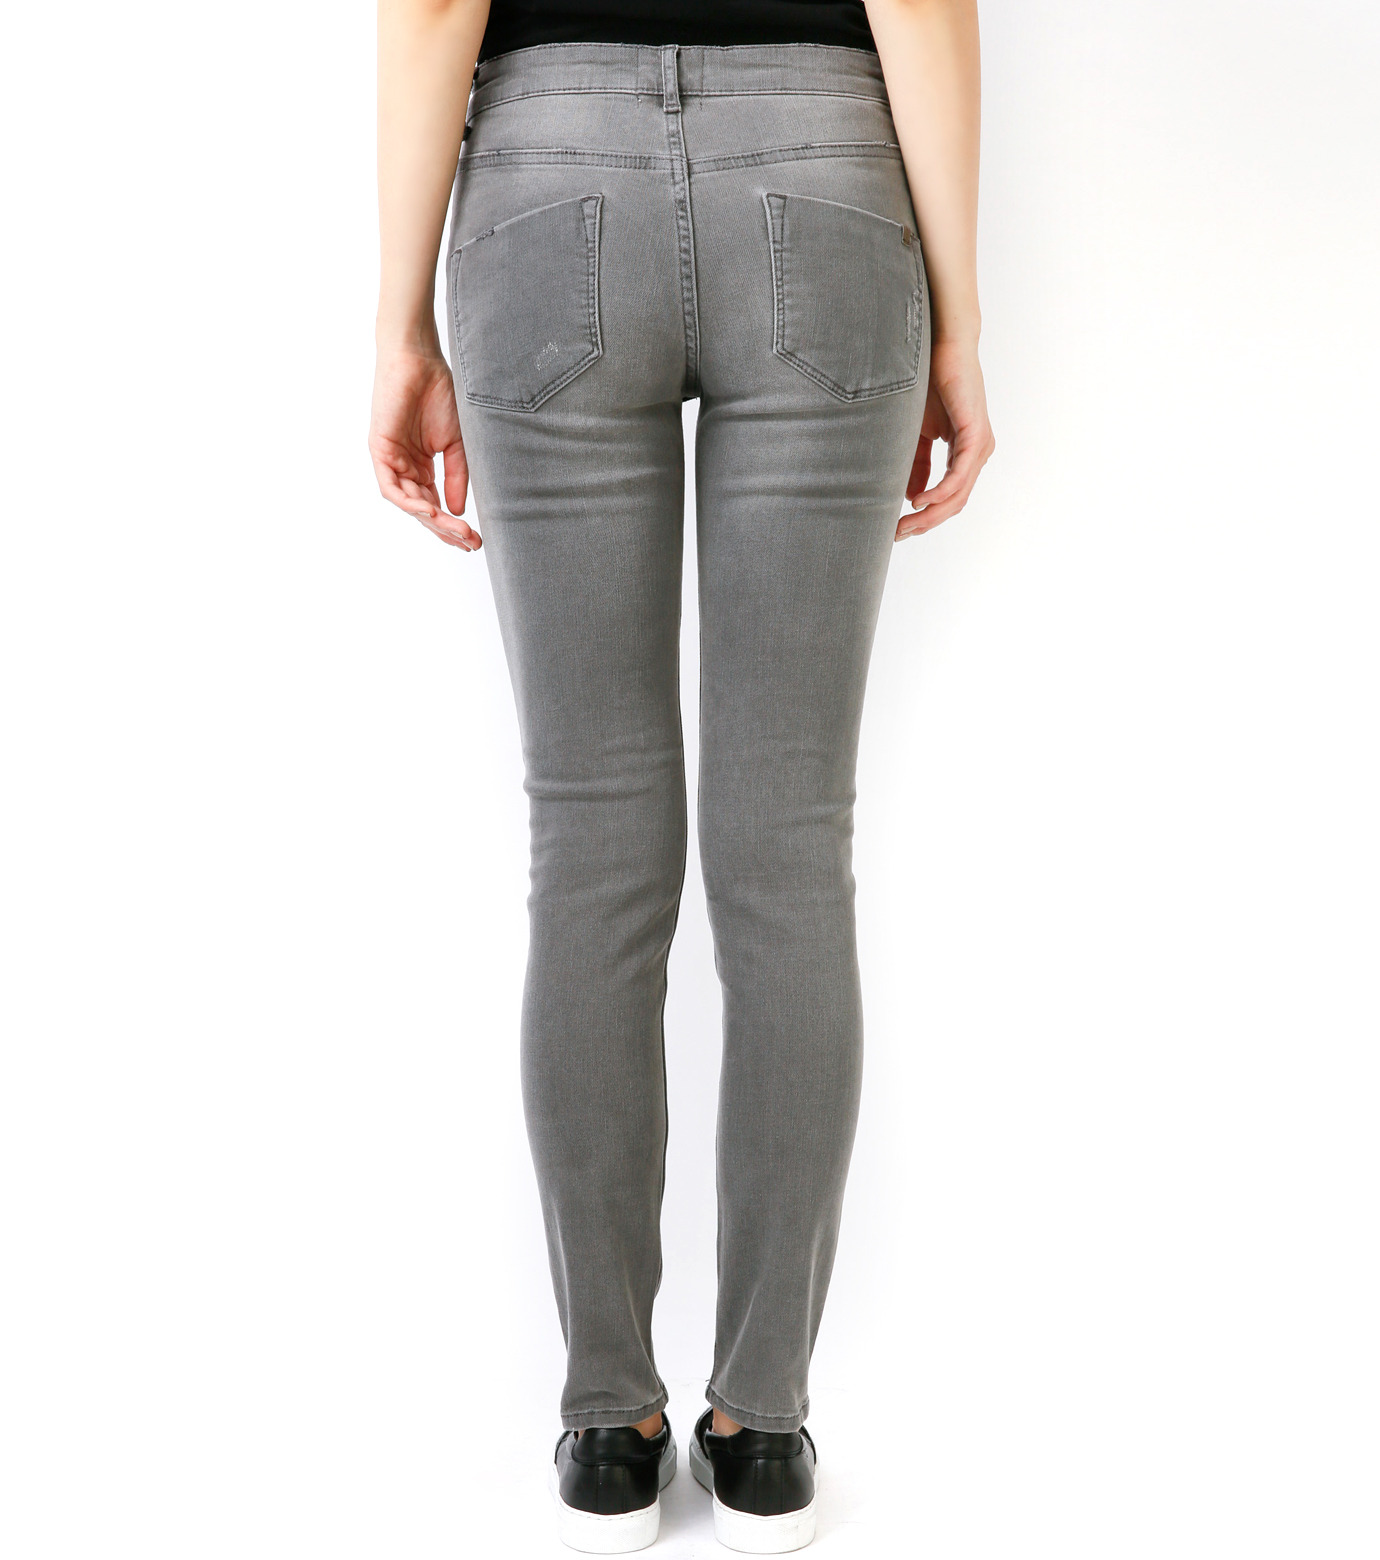 LE CIEL BLEU(ルシェルブルー)のグレ-スキニ- by Essentials-GRAY(パンツ/pants)-17S68008 拡大詳細画像5